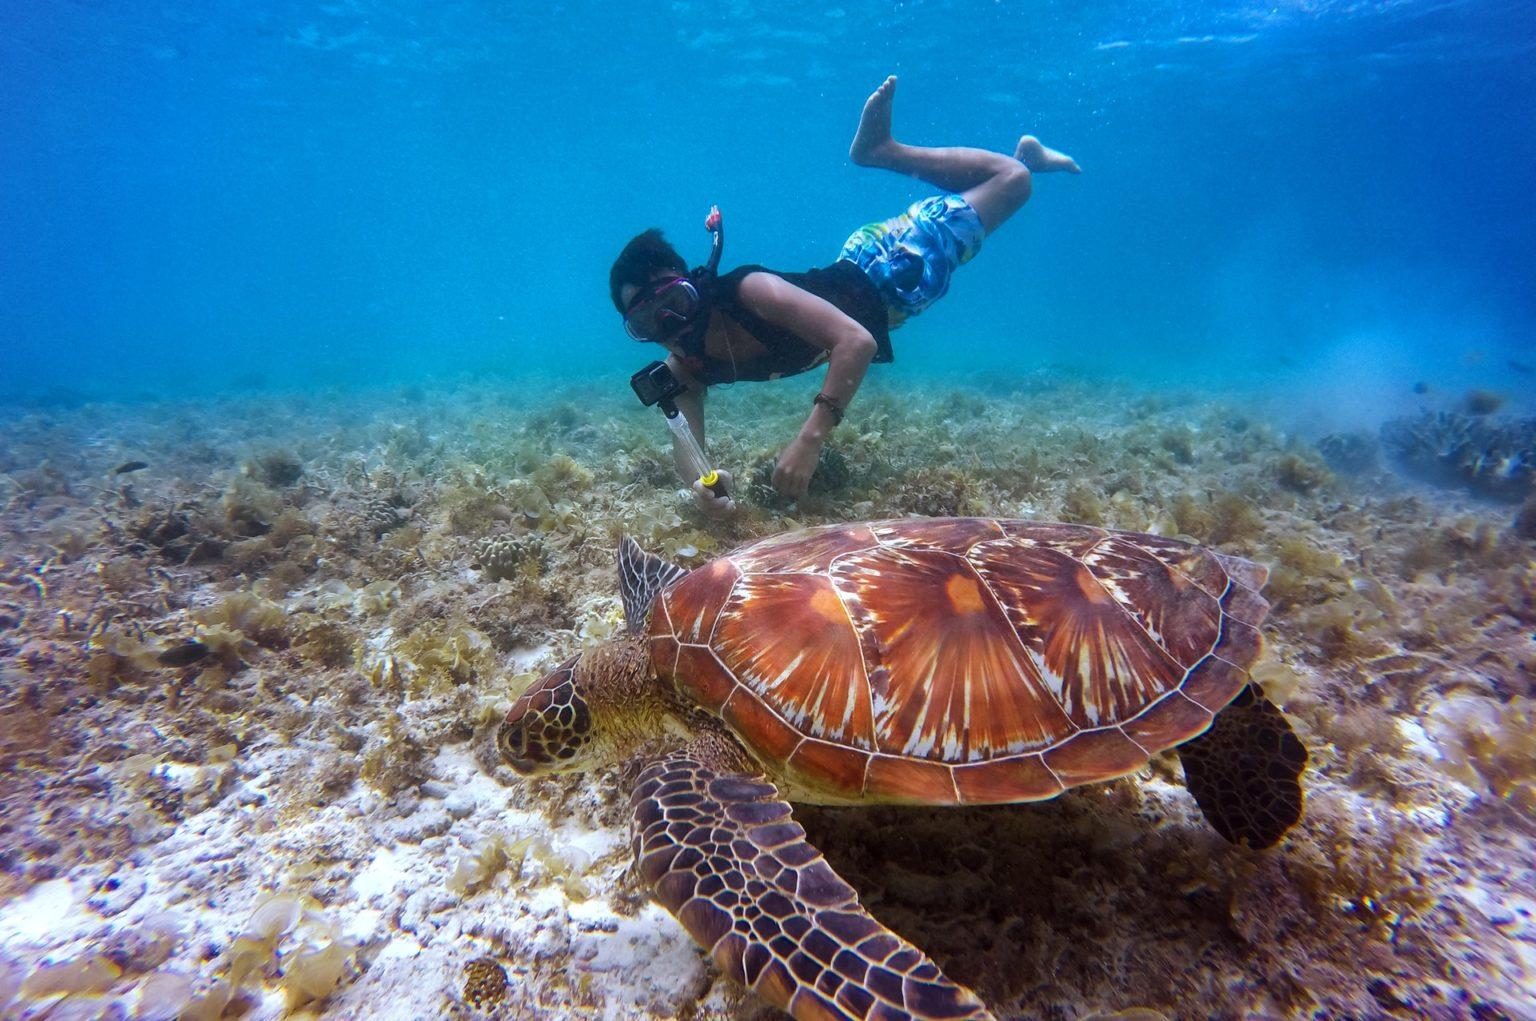 brown-tortoise-in-body-of-water-beside-man-3041869